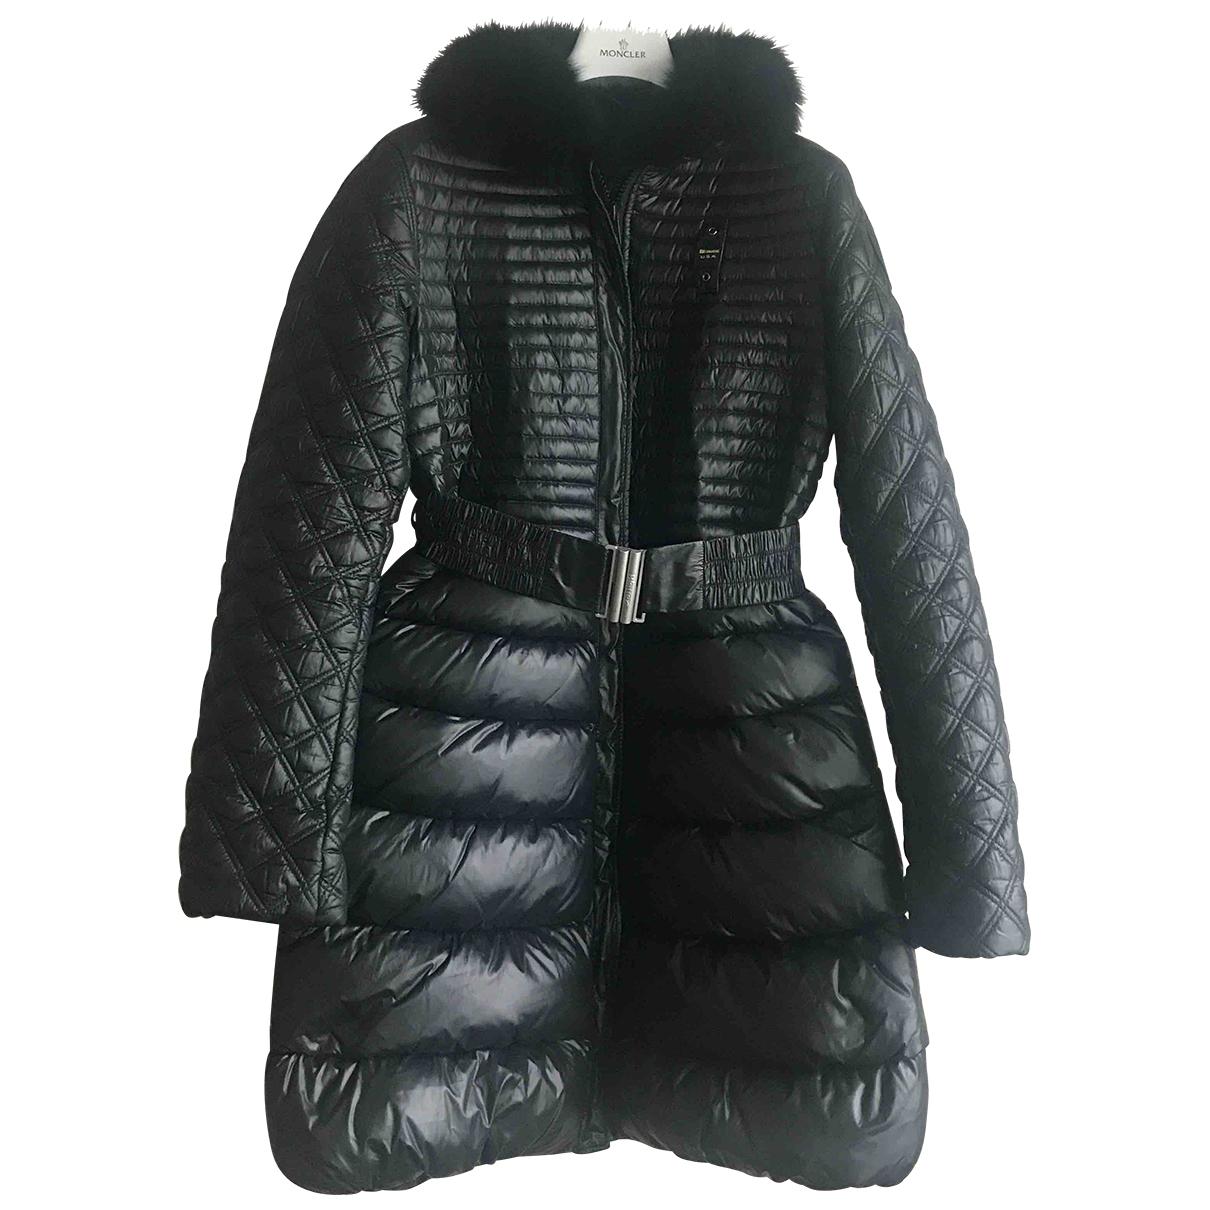 Blauer \N Black coat for Women M International